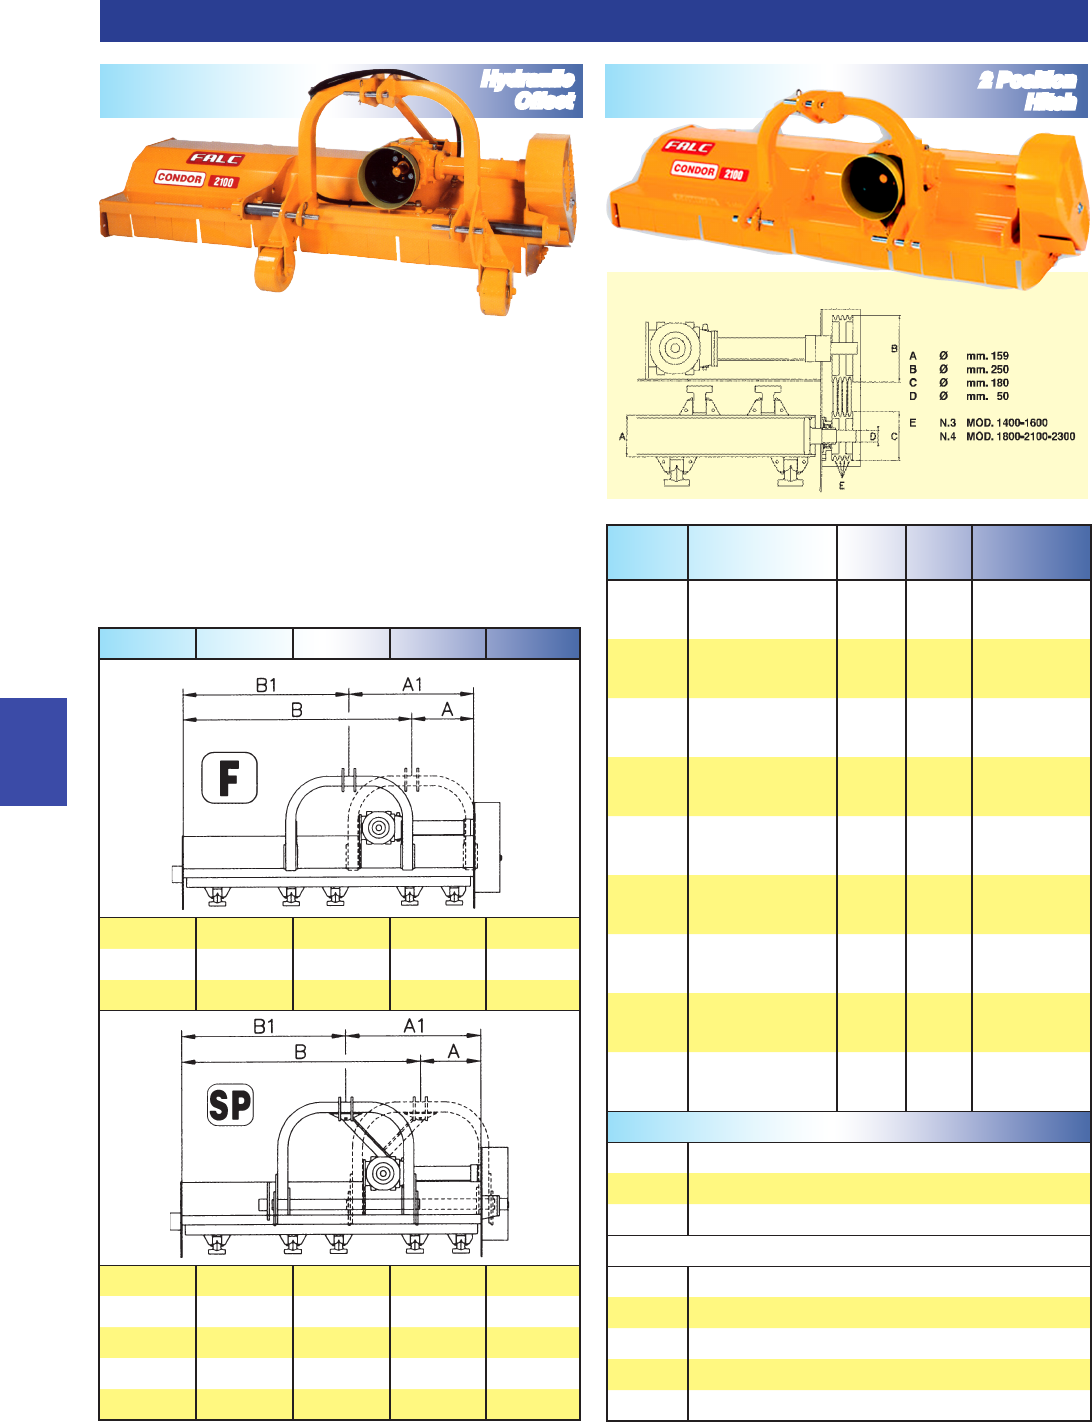 Catalog No Prices 2017 Ideal 2245 4 Mm Paper Shredder Falc Shredders